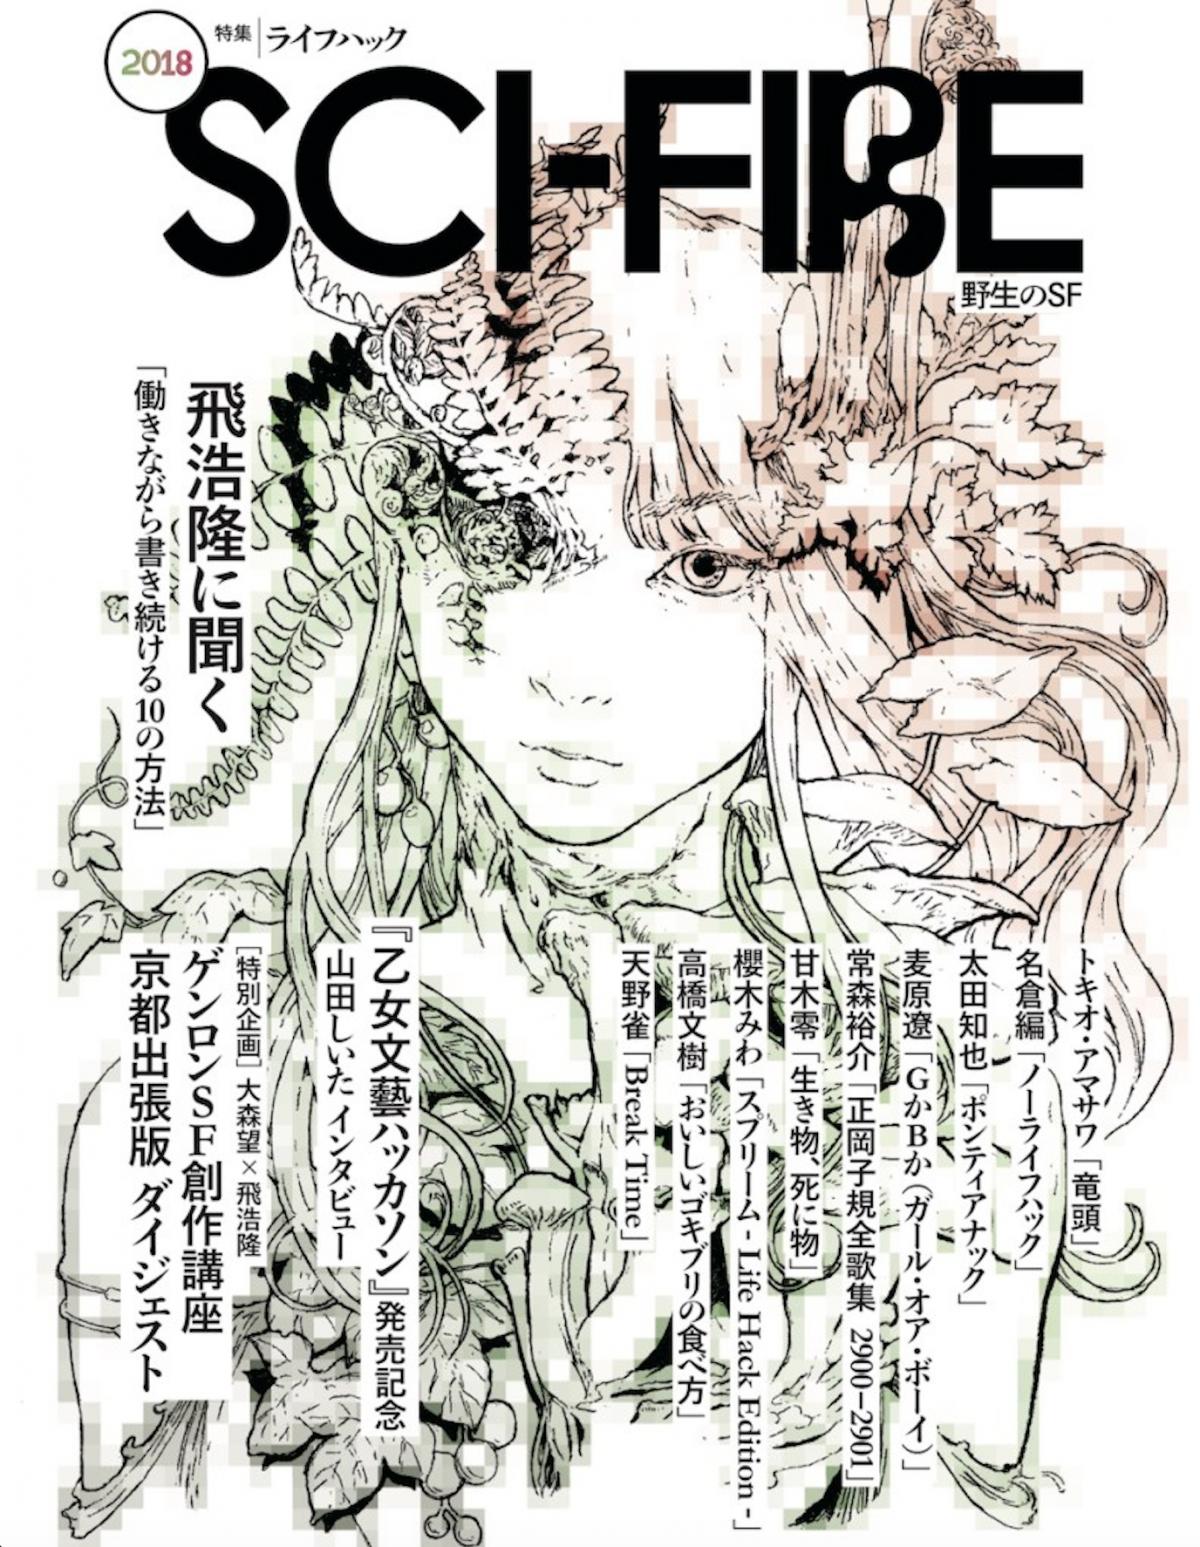 Sci-Fire 2018 – 甘木零の時代小説SFが素晴らしかった